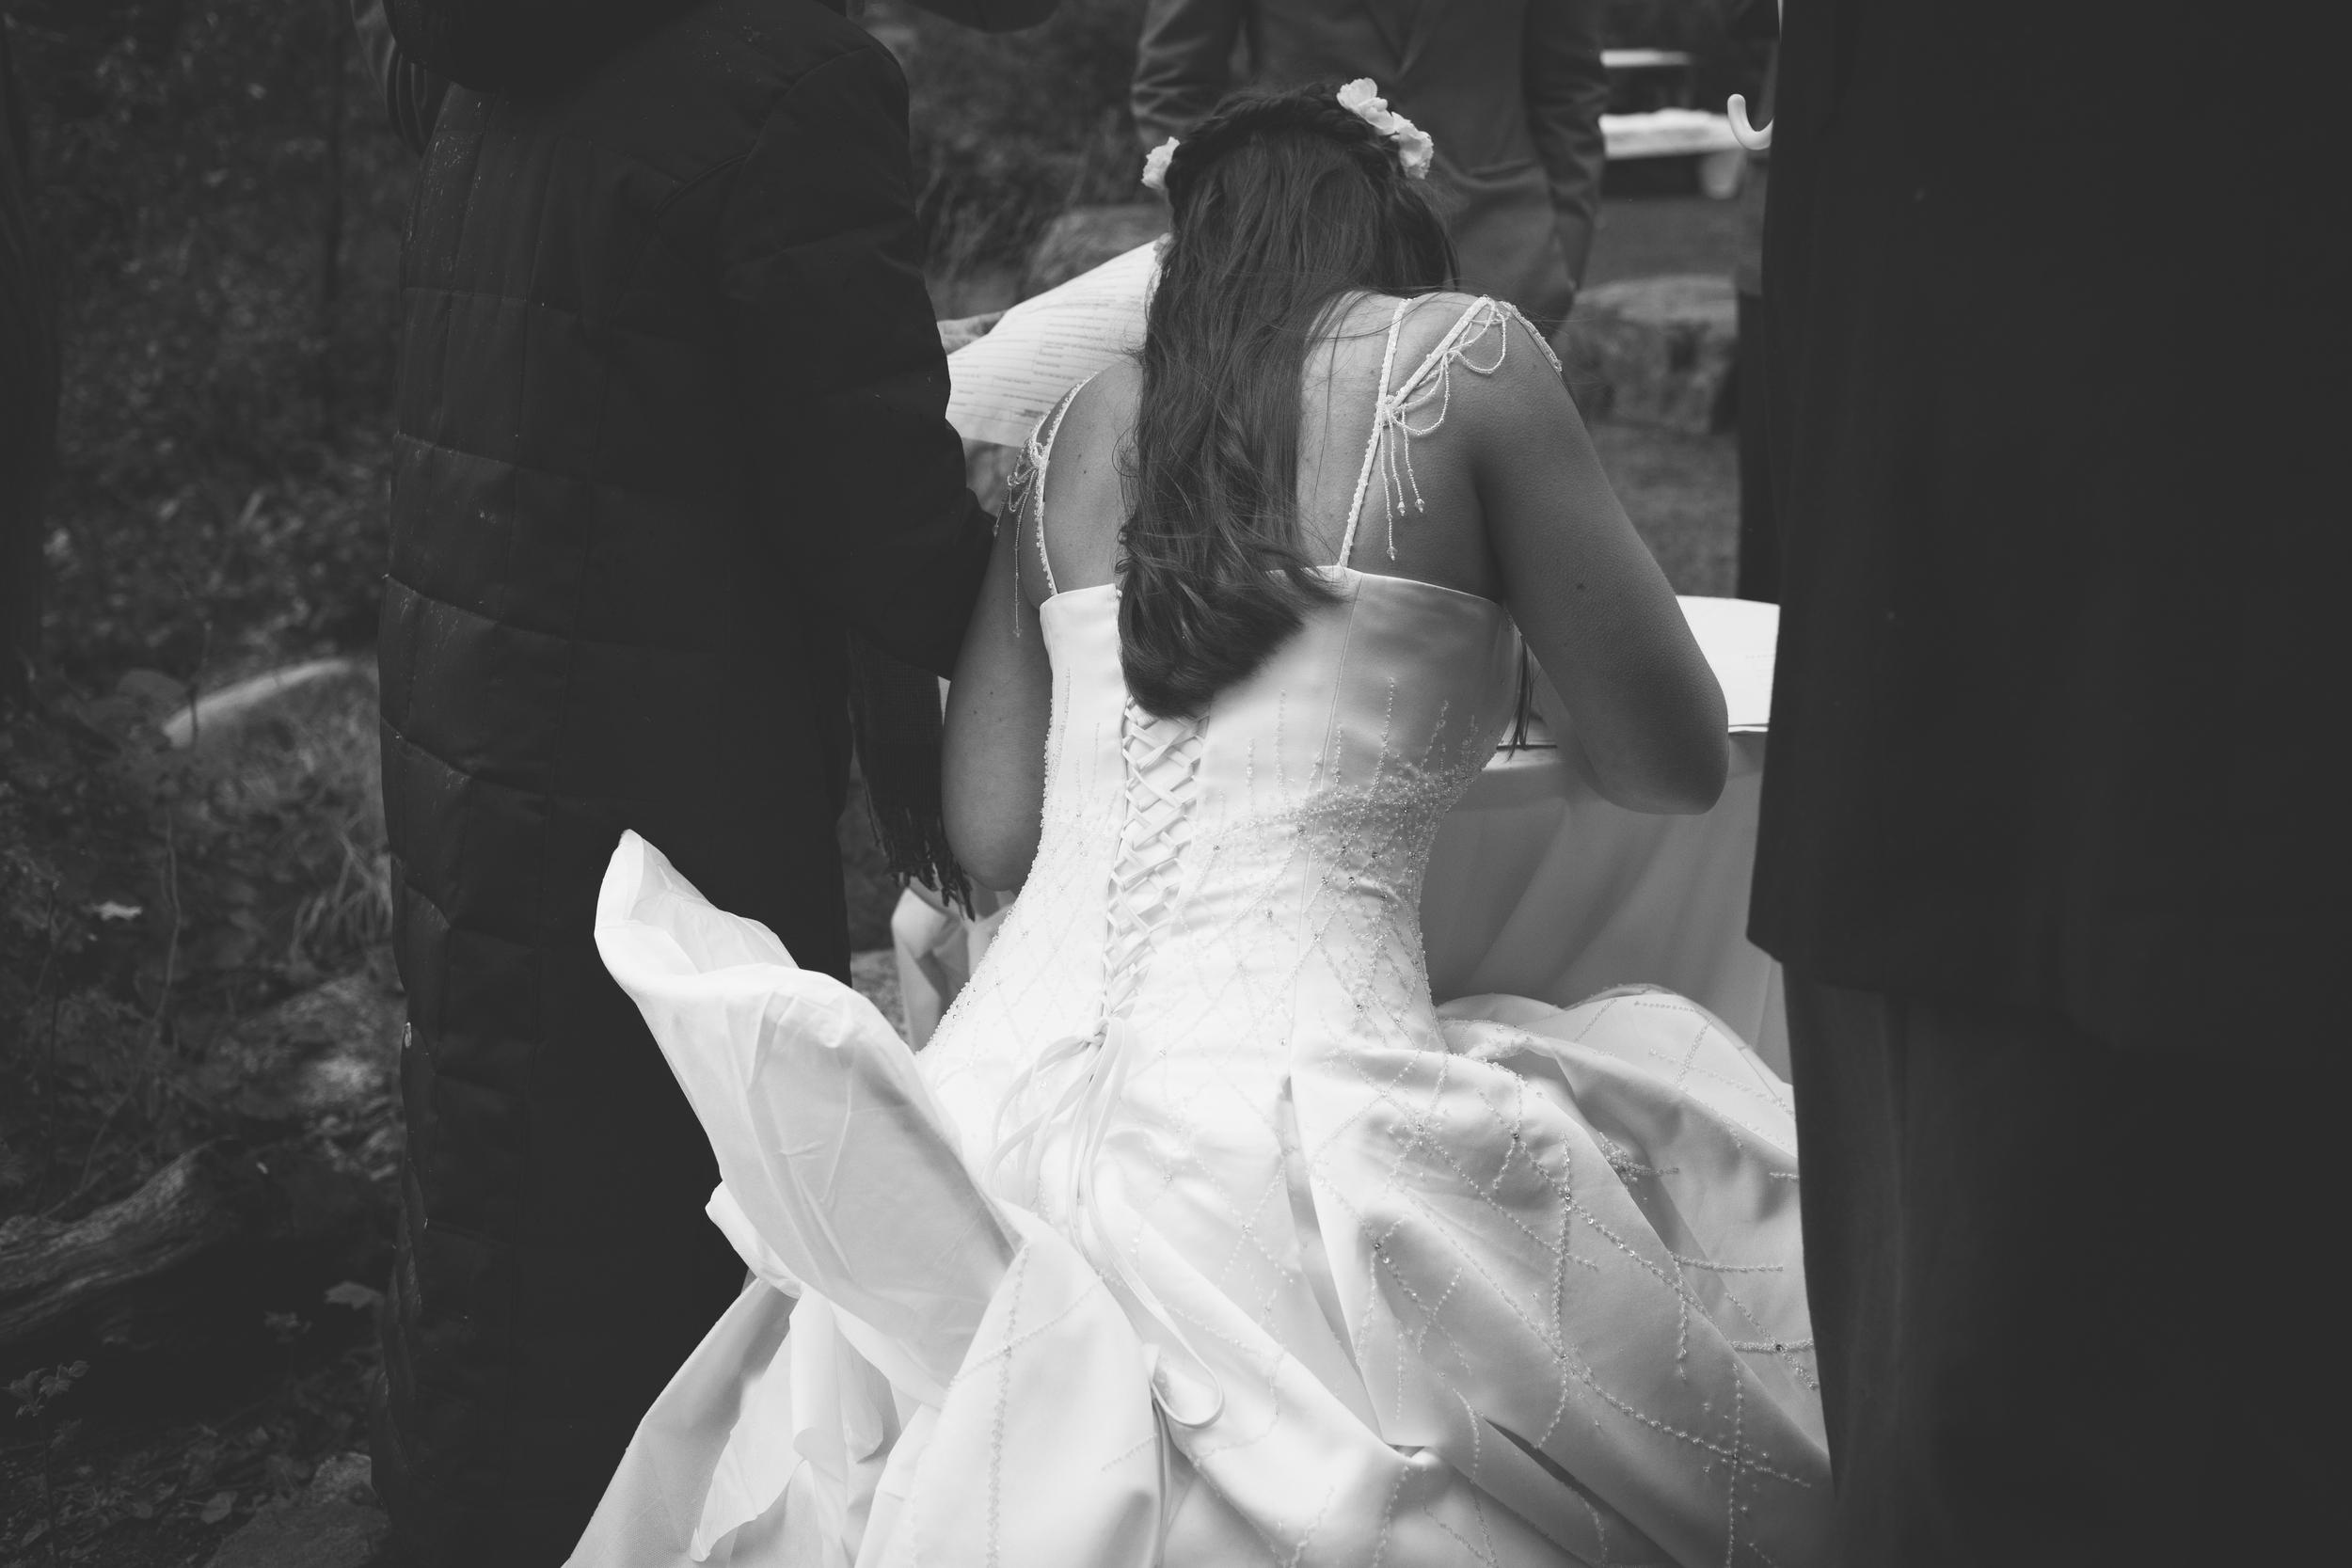 vancouver_photographer_wedding_DogwoodPhotography-1.jpg